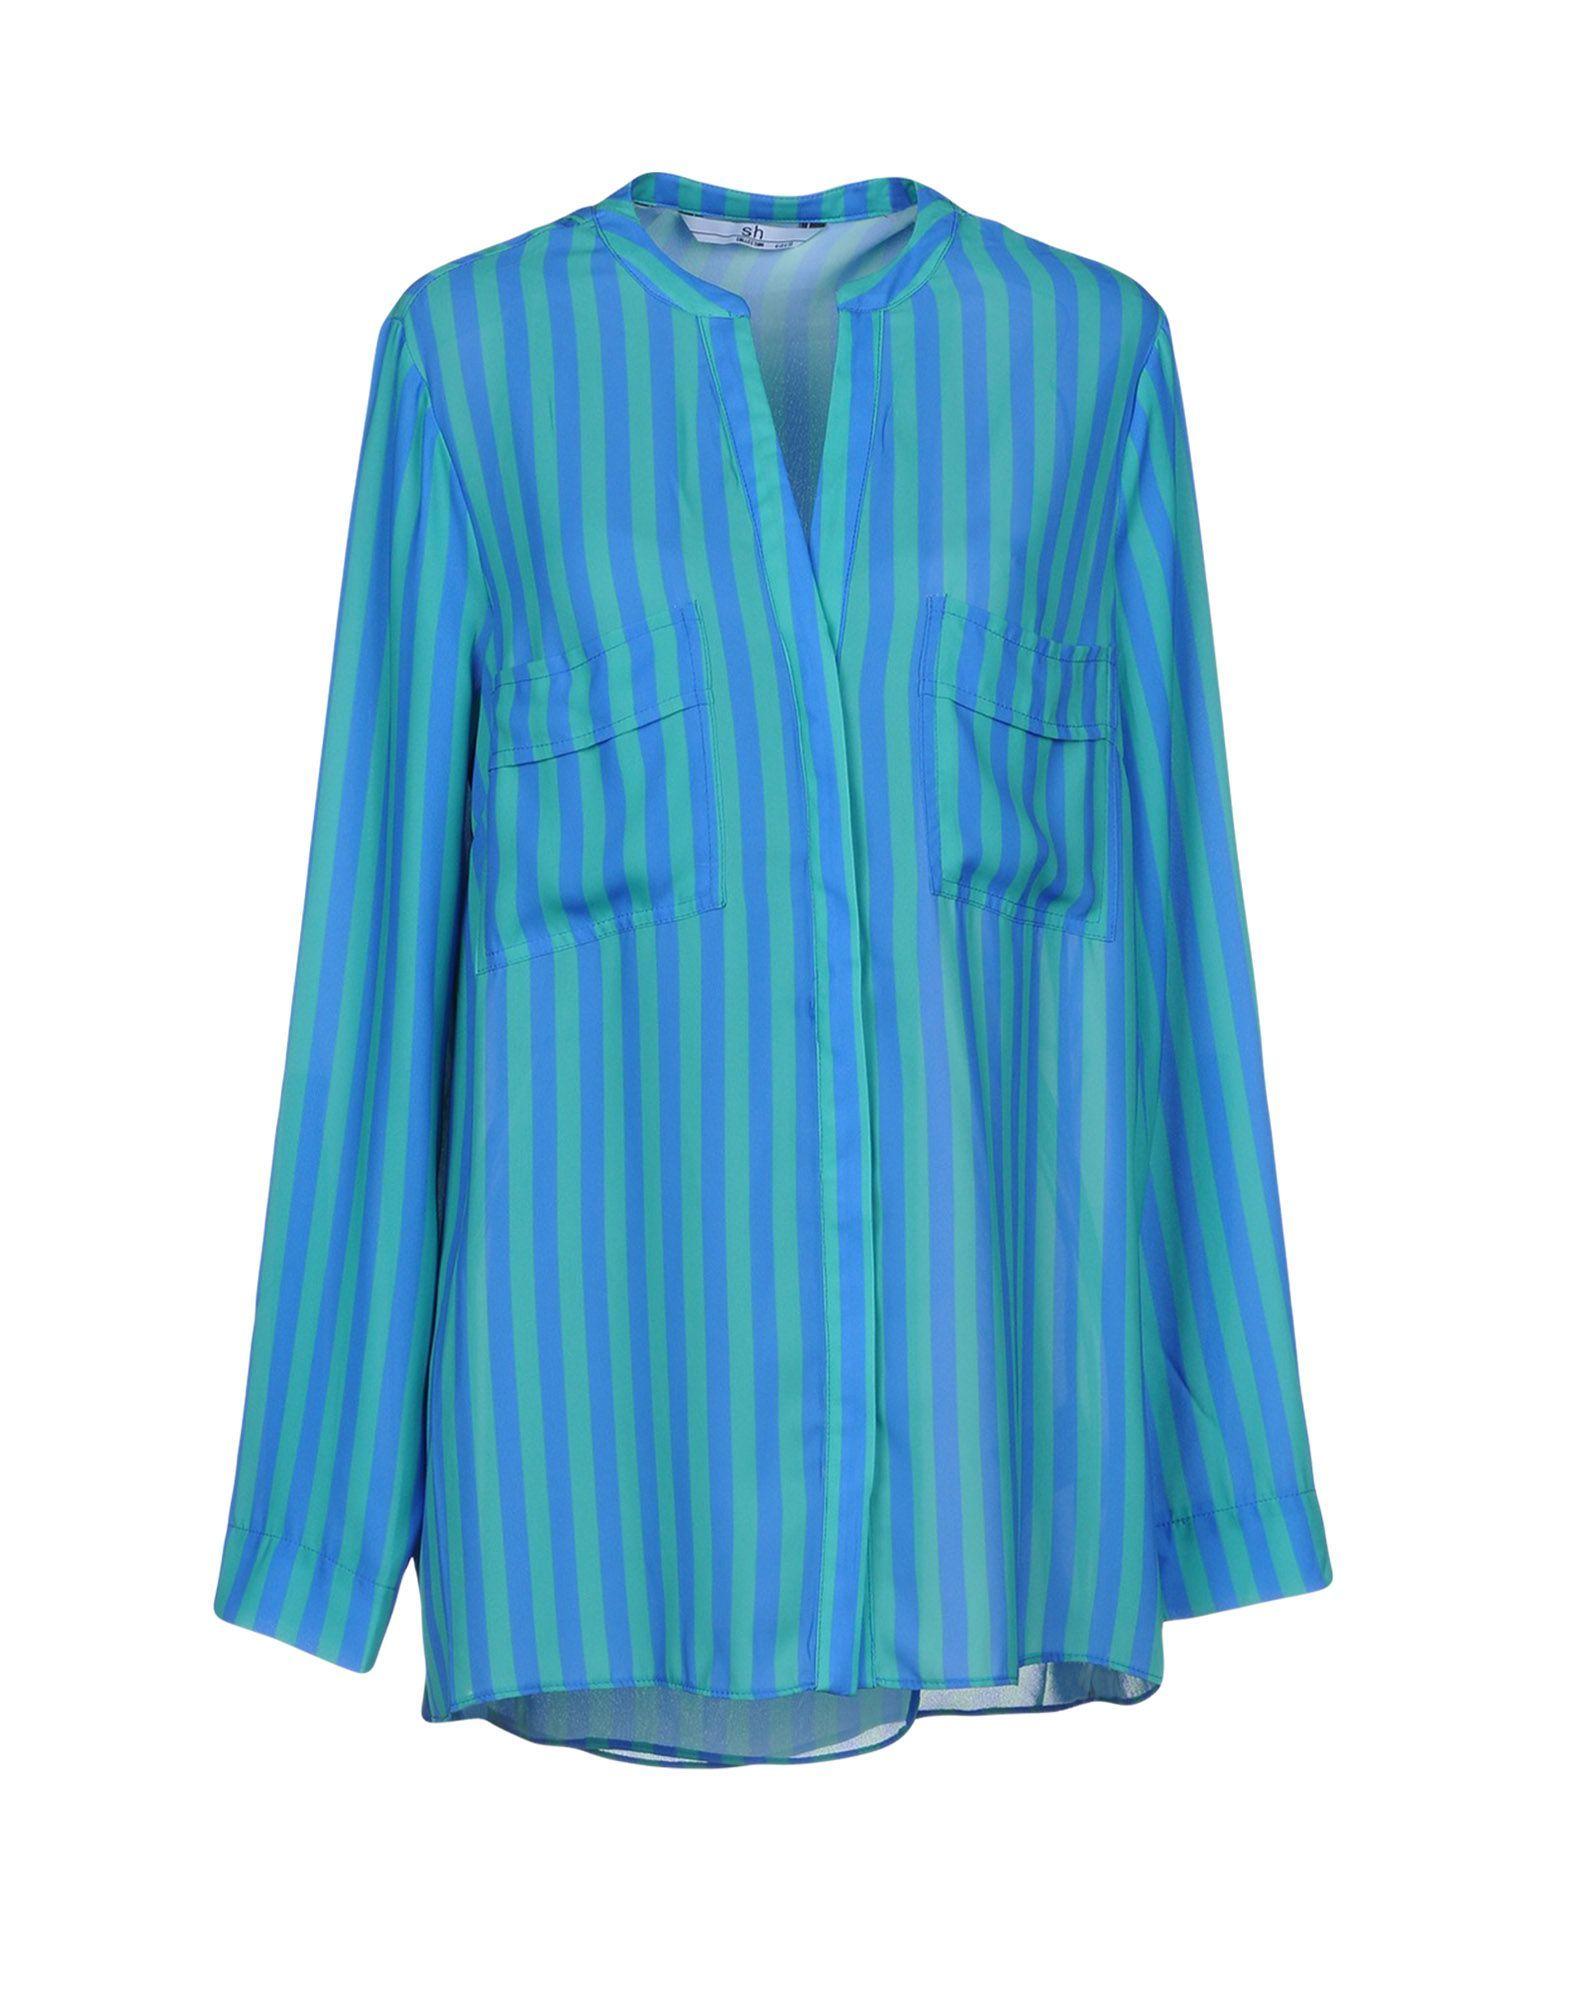 best service d10ad dc3d0 SH by SILVIAN HEACH Striped shirt - Shirts in 2019 ...